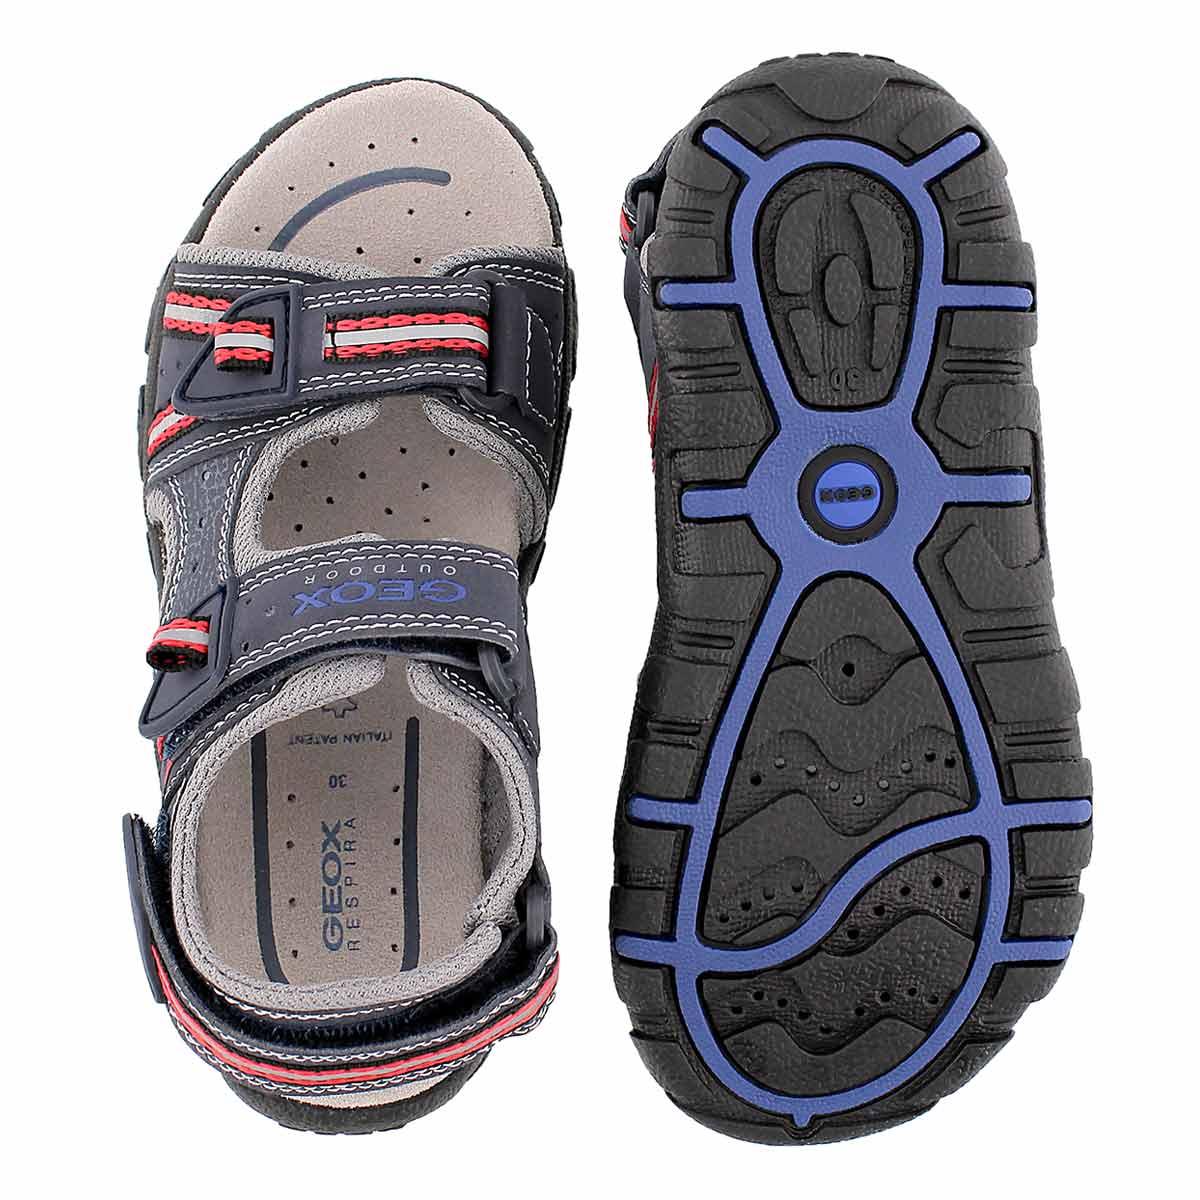 Bys Strada navy/red sport sandal